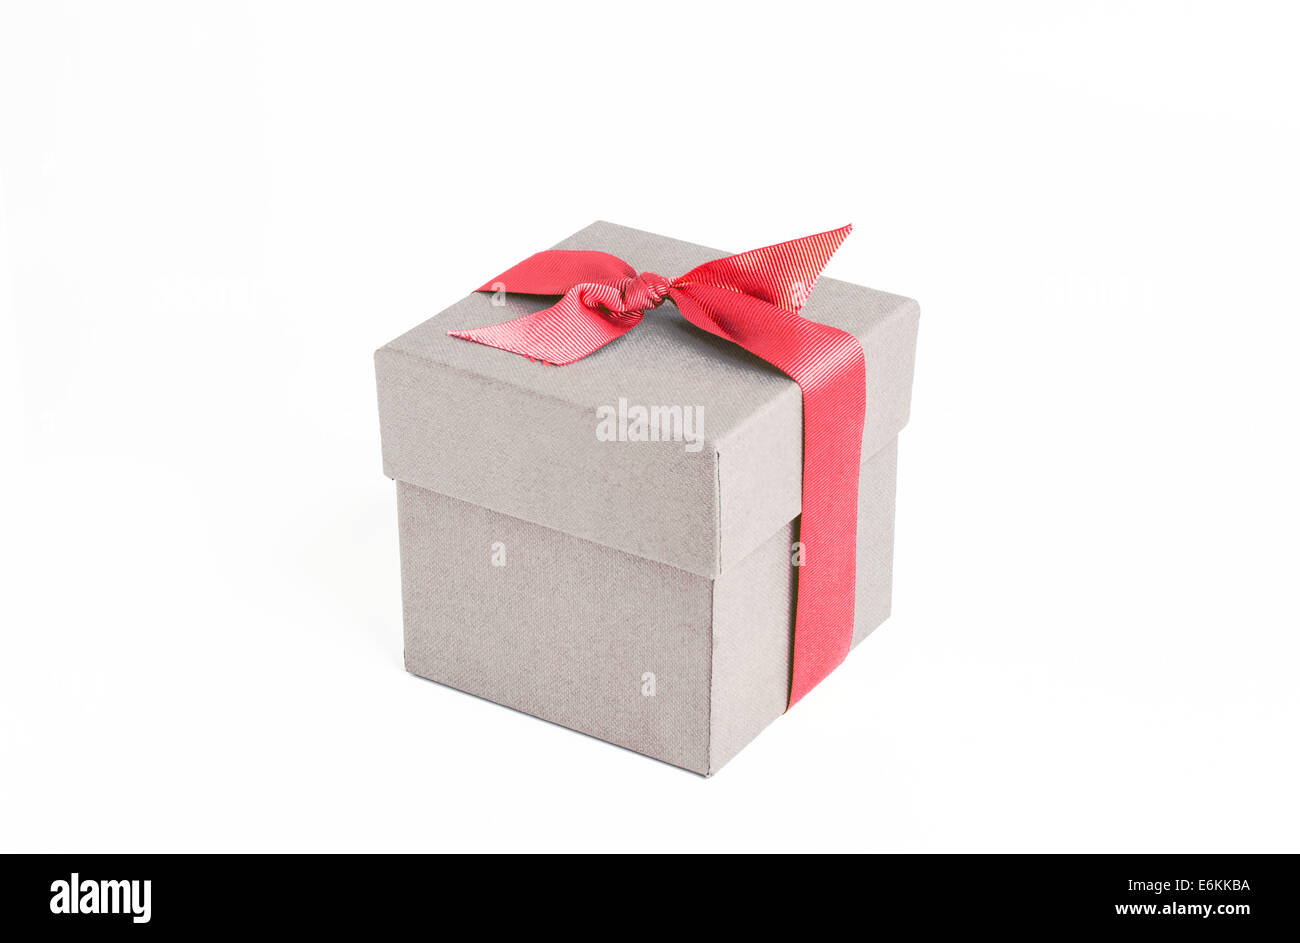 Caja de regalo con cinta roja Imagen De Stock